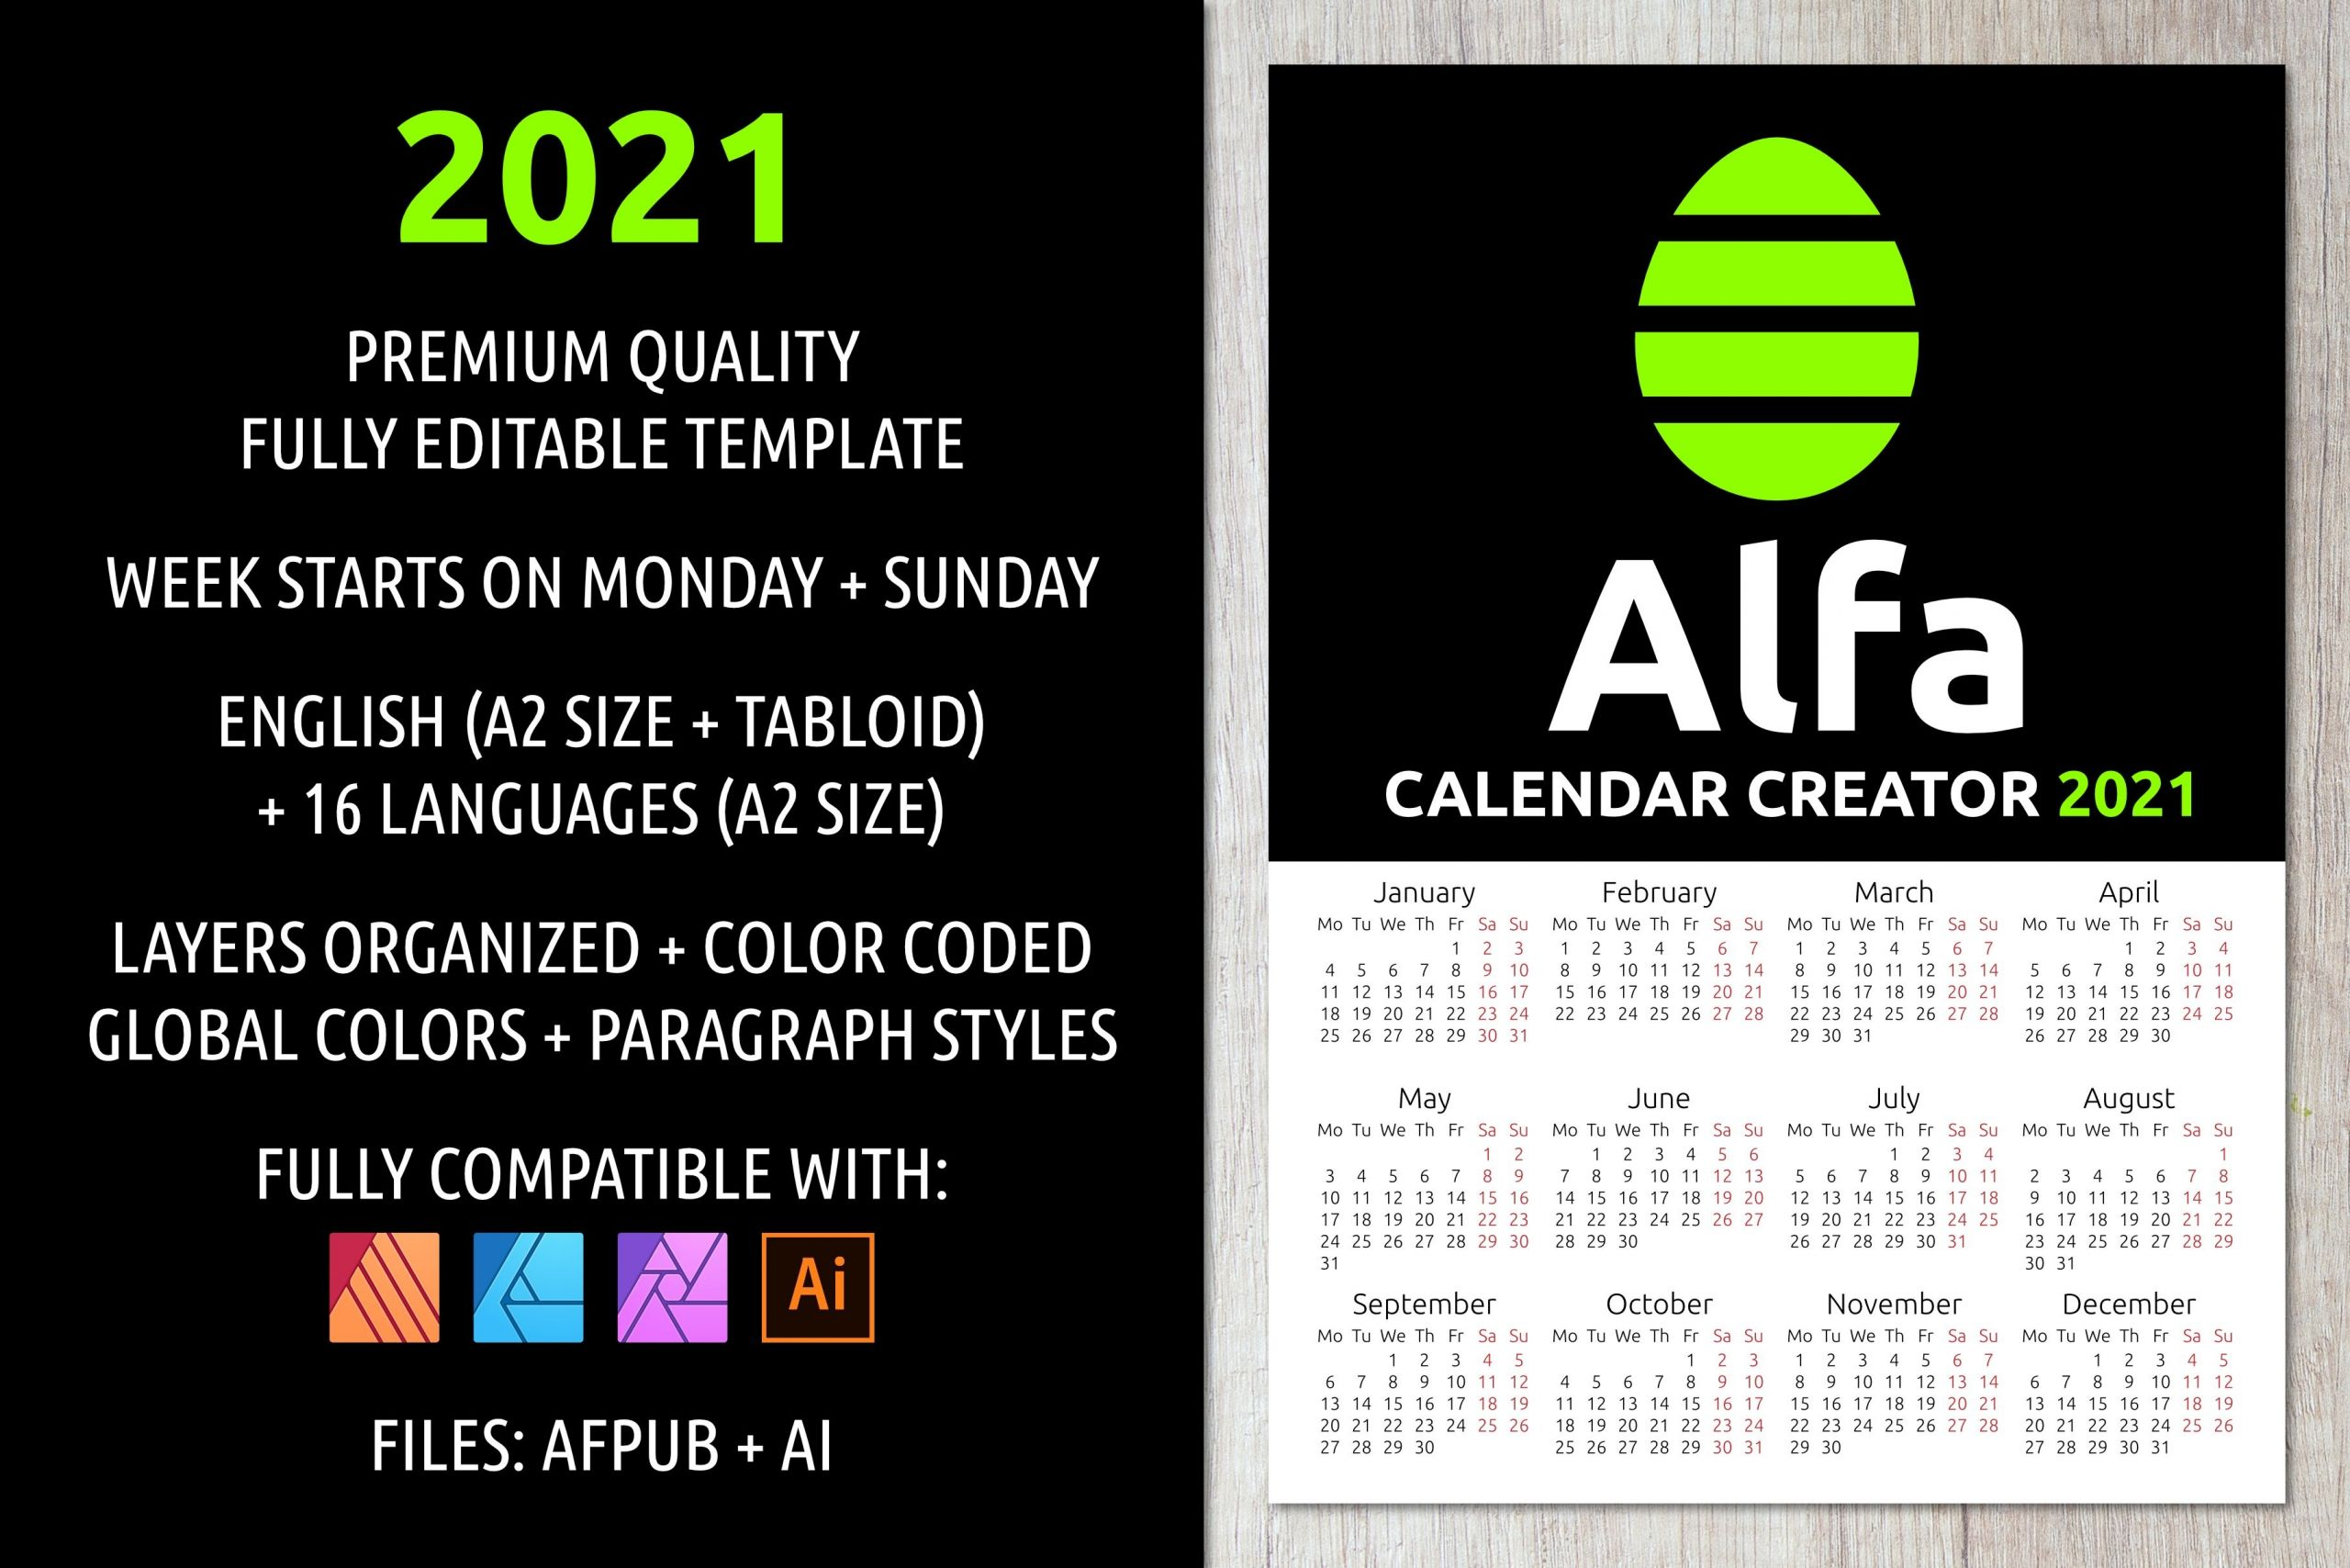 Alfa Calendar Creator 2021